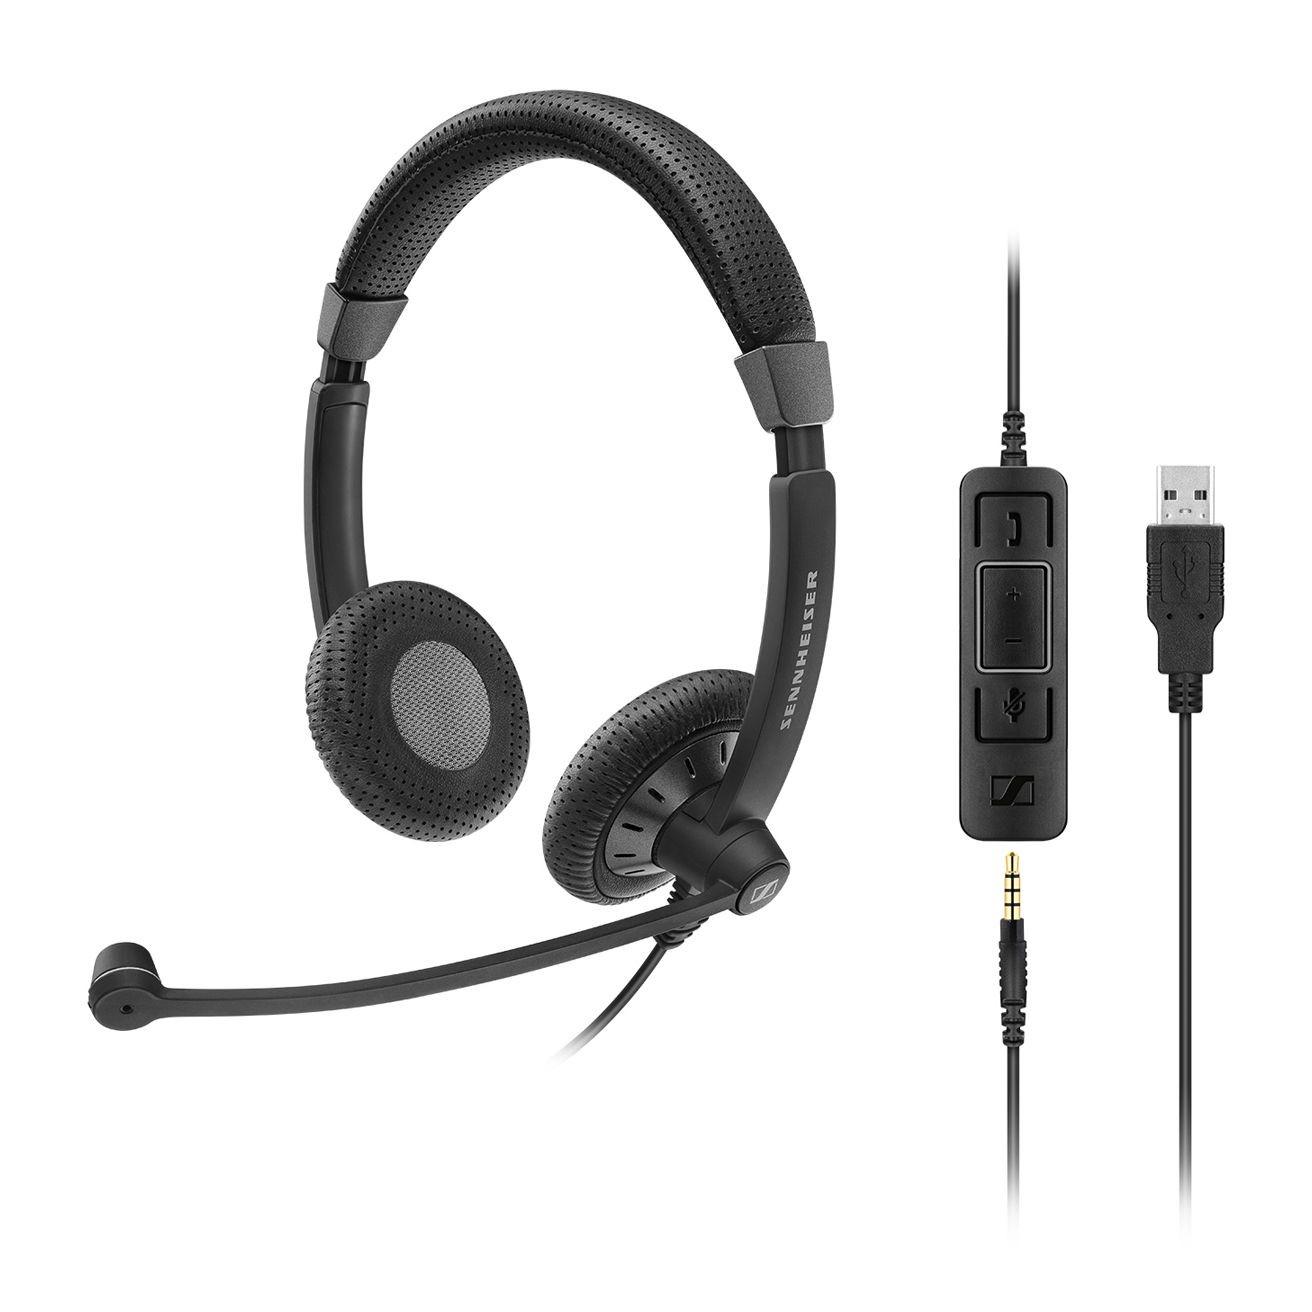 Sennheiser SC75 Duo USB CTRL Headset